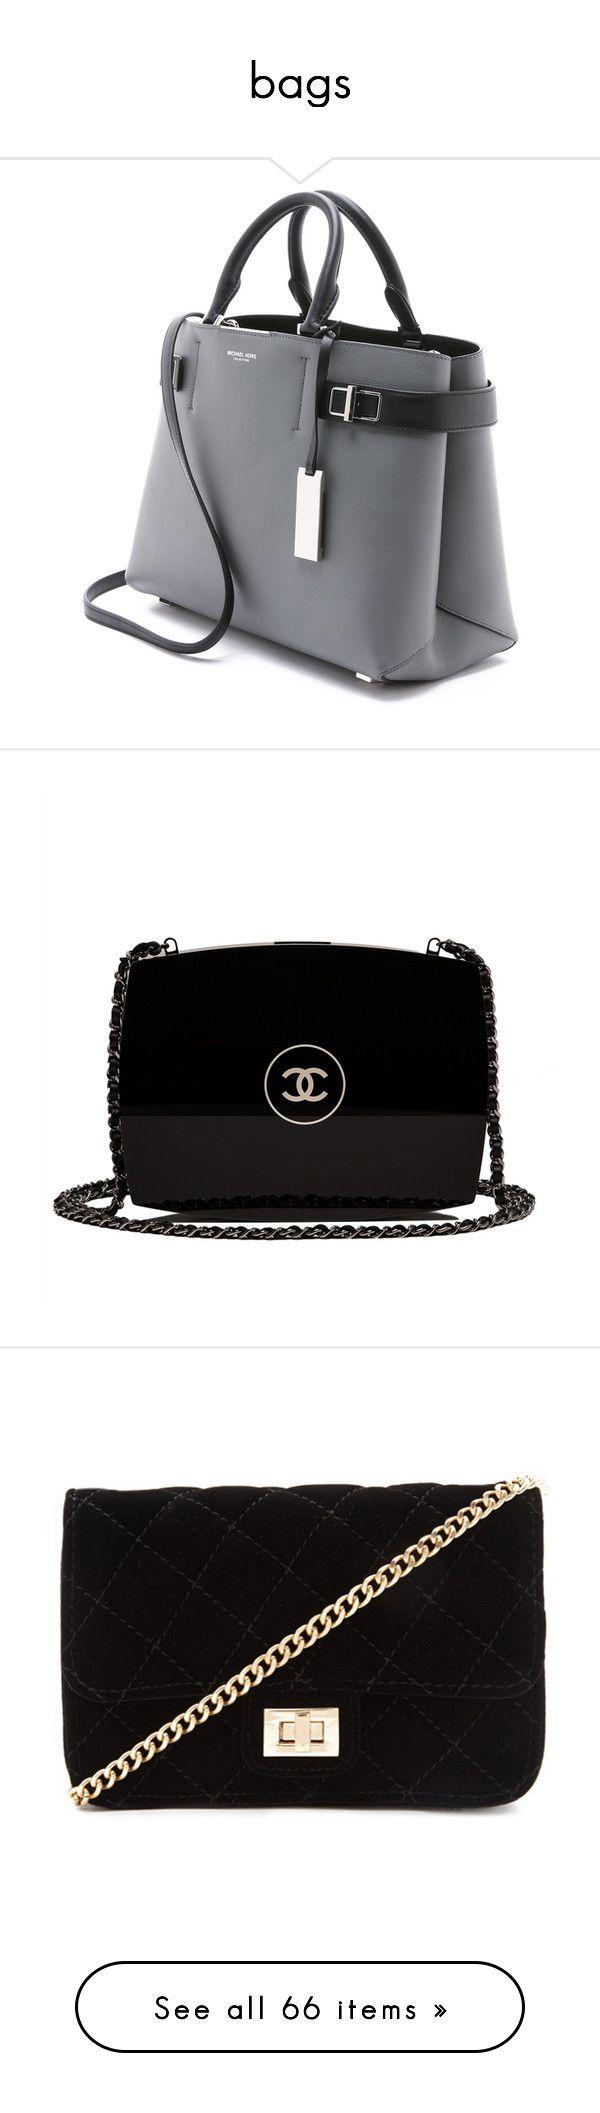 """bags"" by iniziojorina on Polyvore featuring bags, handbags, michael kors purses, michael kors, satchel handbags, michael kors handbags, leather purse, clutches, purses and black purse"